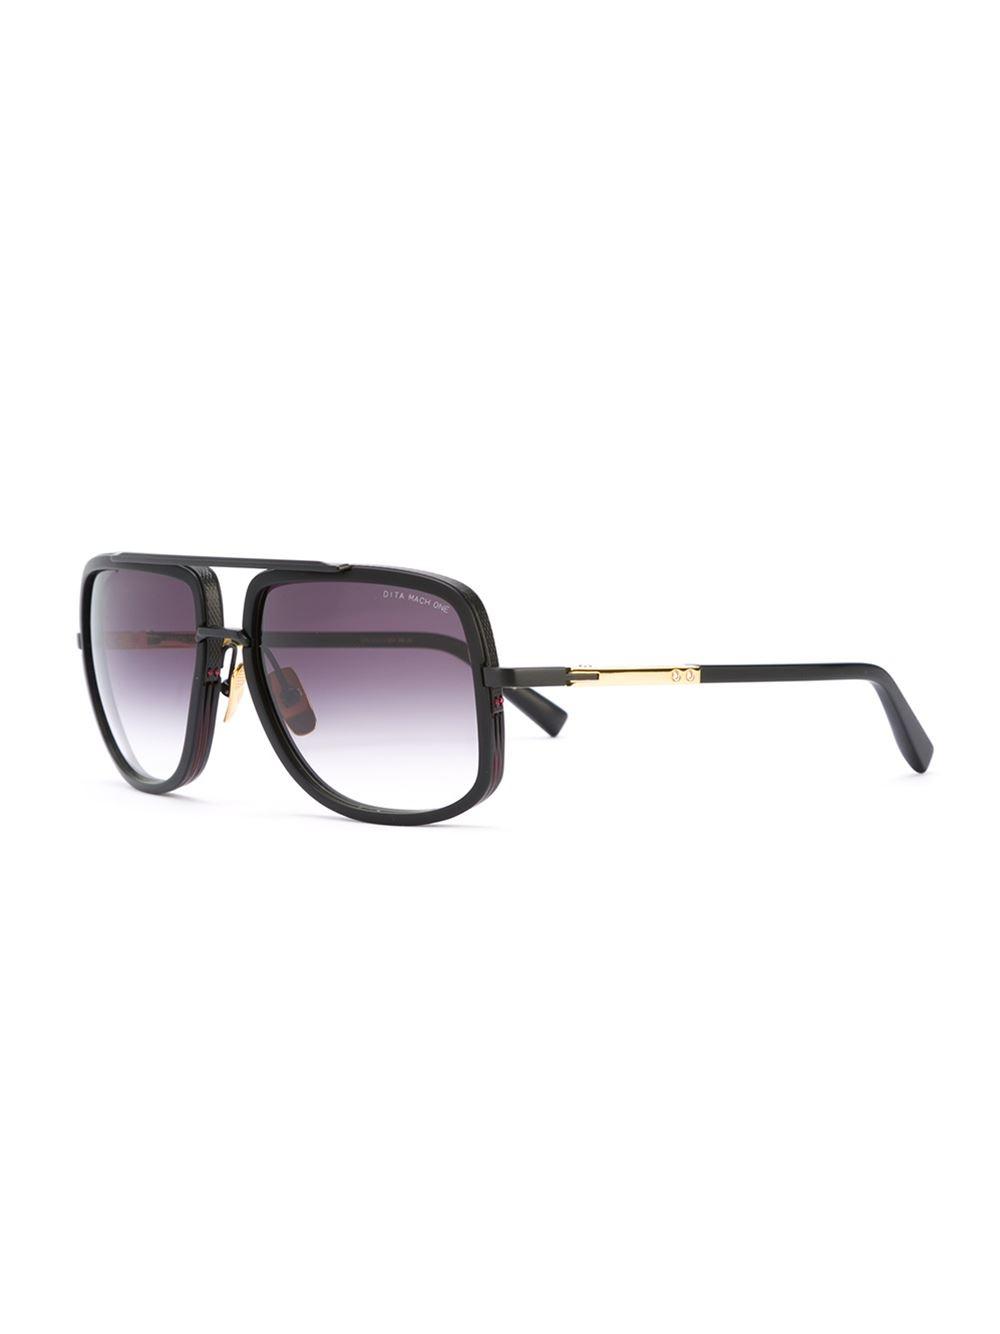 Dita Eyewear - 'mach One' Sunglasses - Men - Titanium - One Size in Black